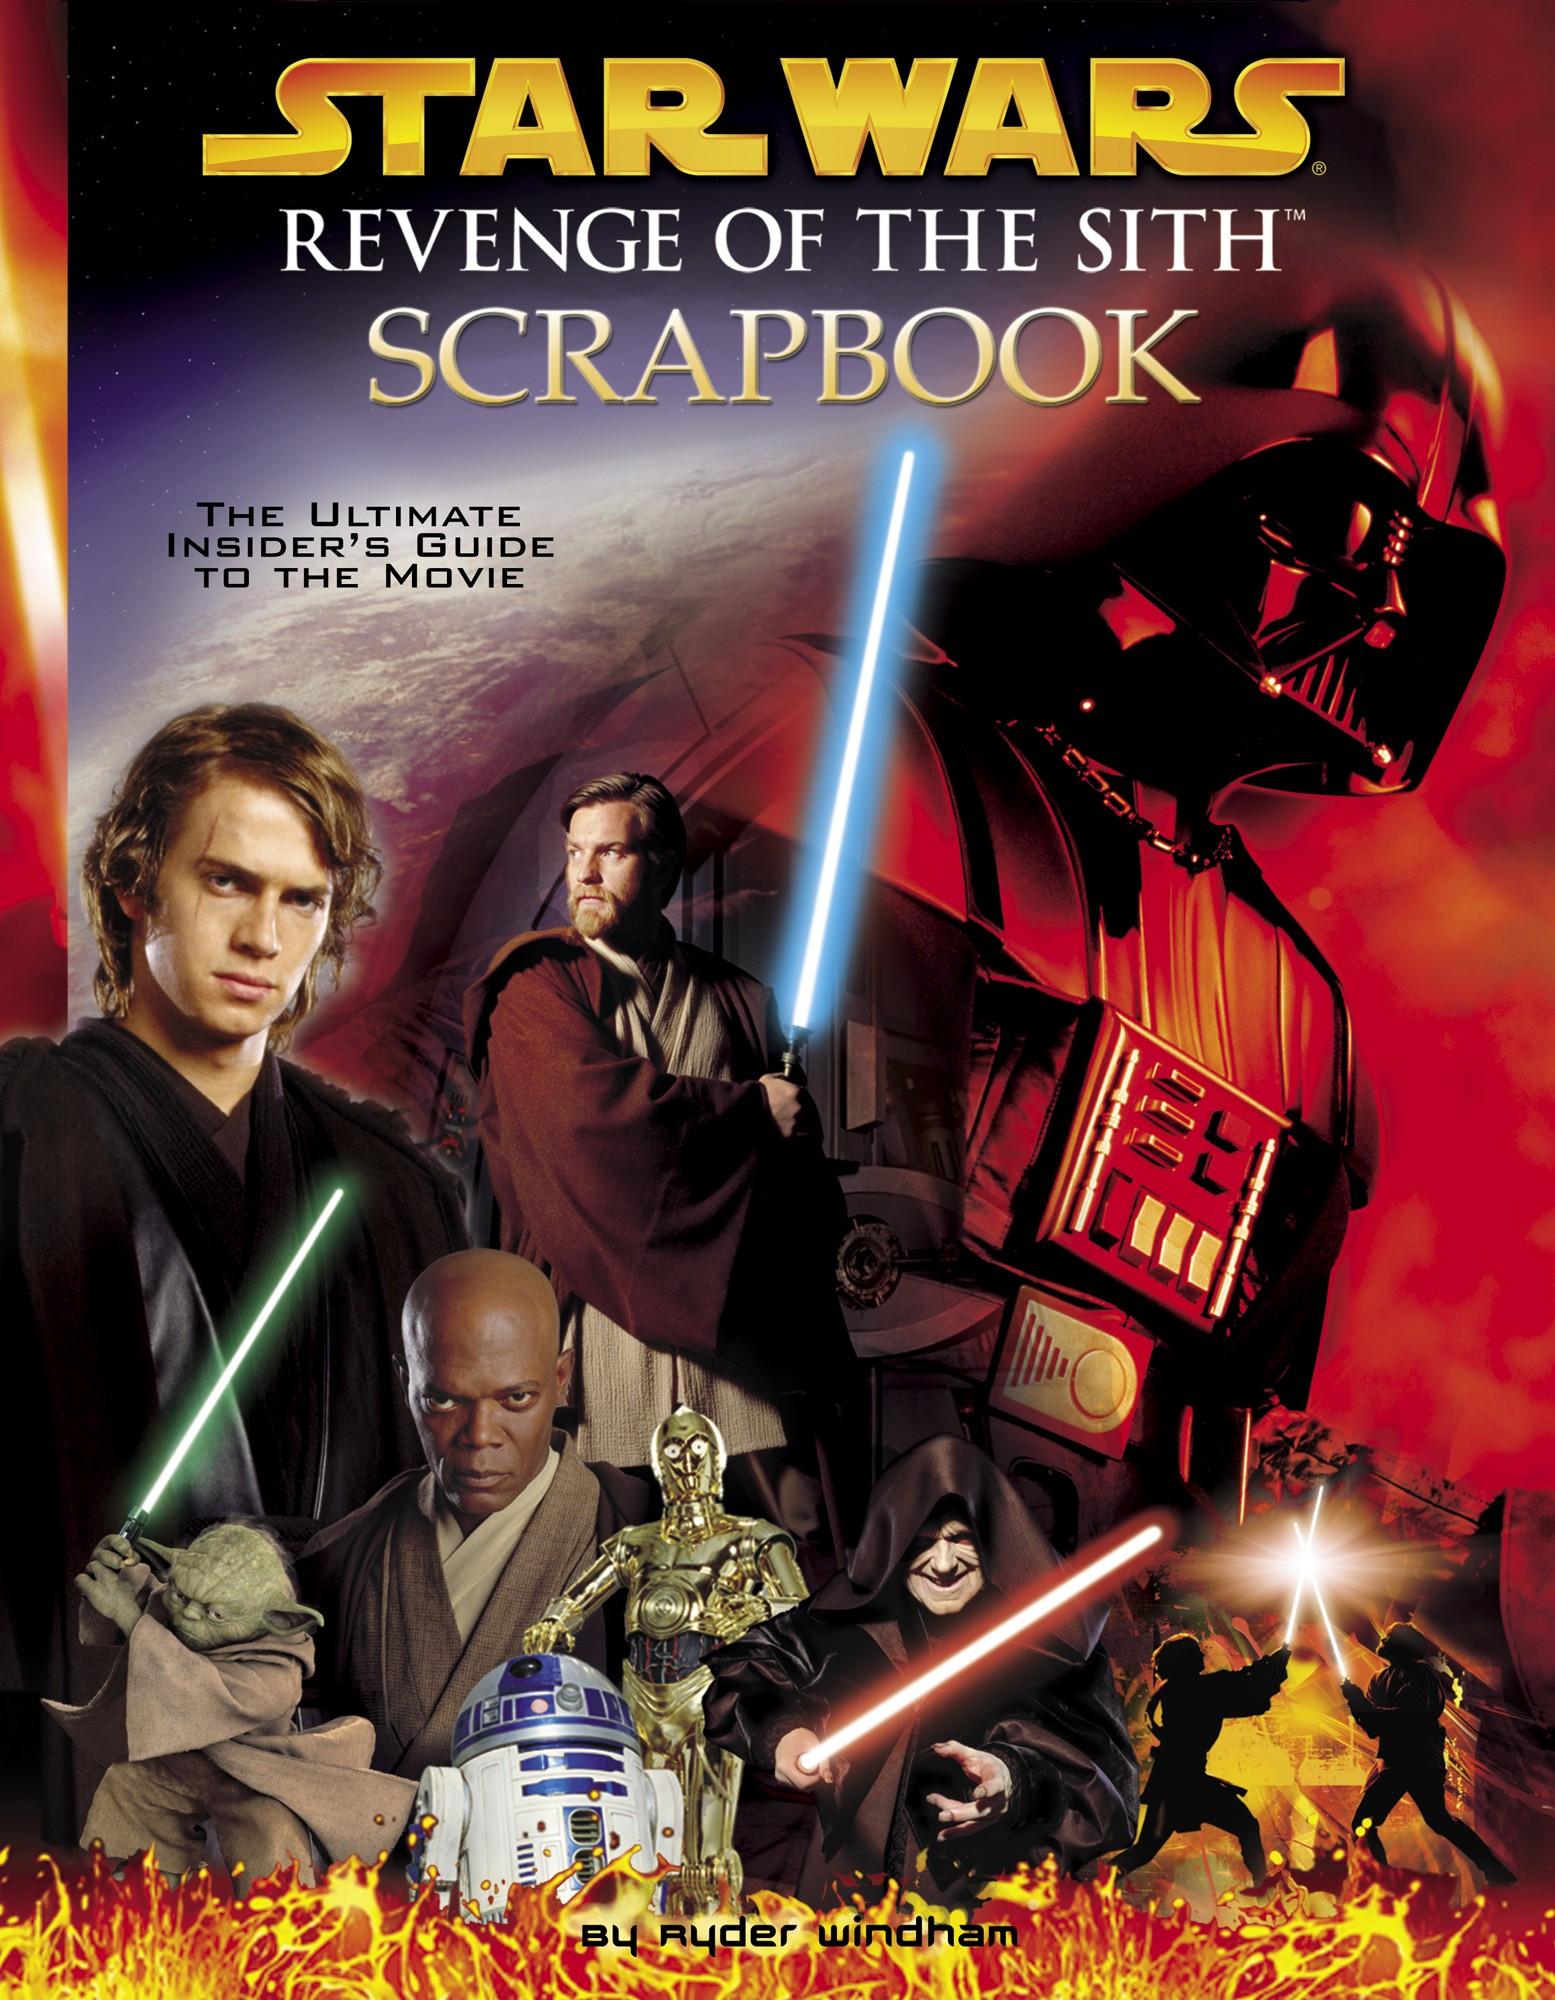 Star Wars Revenge Of The Sith Scrapbook Wookieepedia Fandom